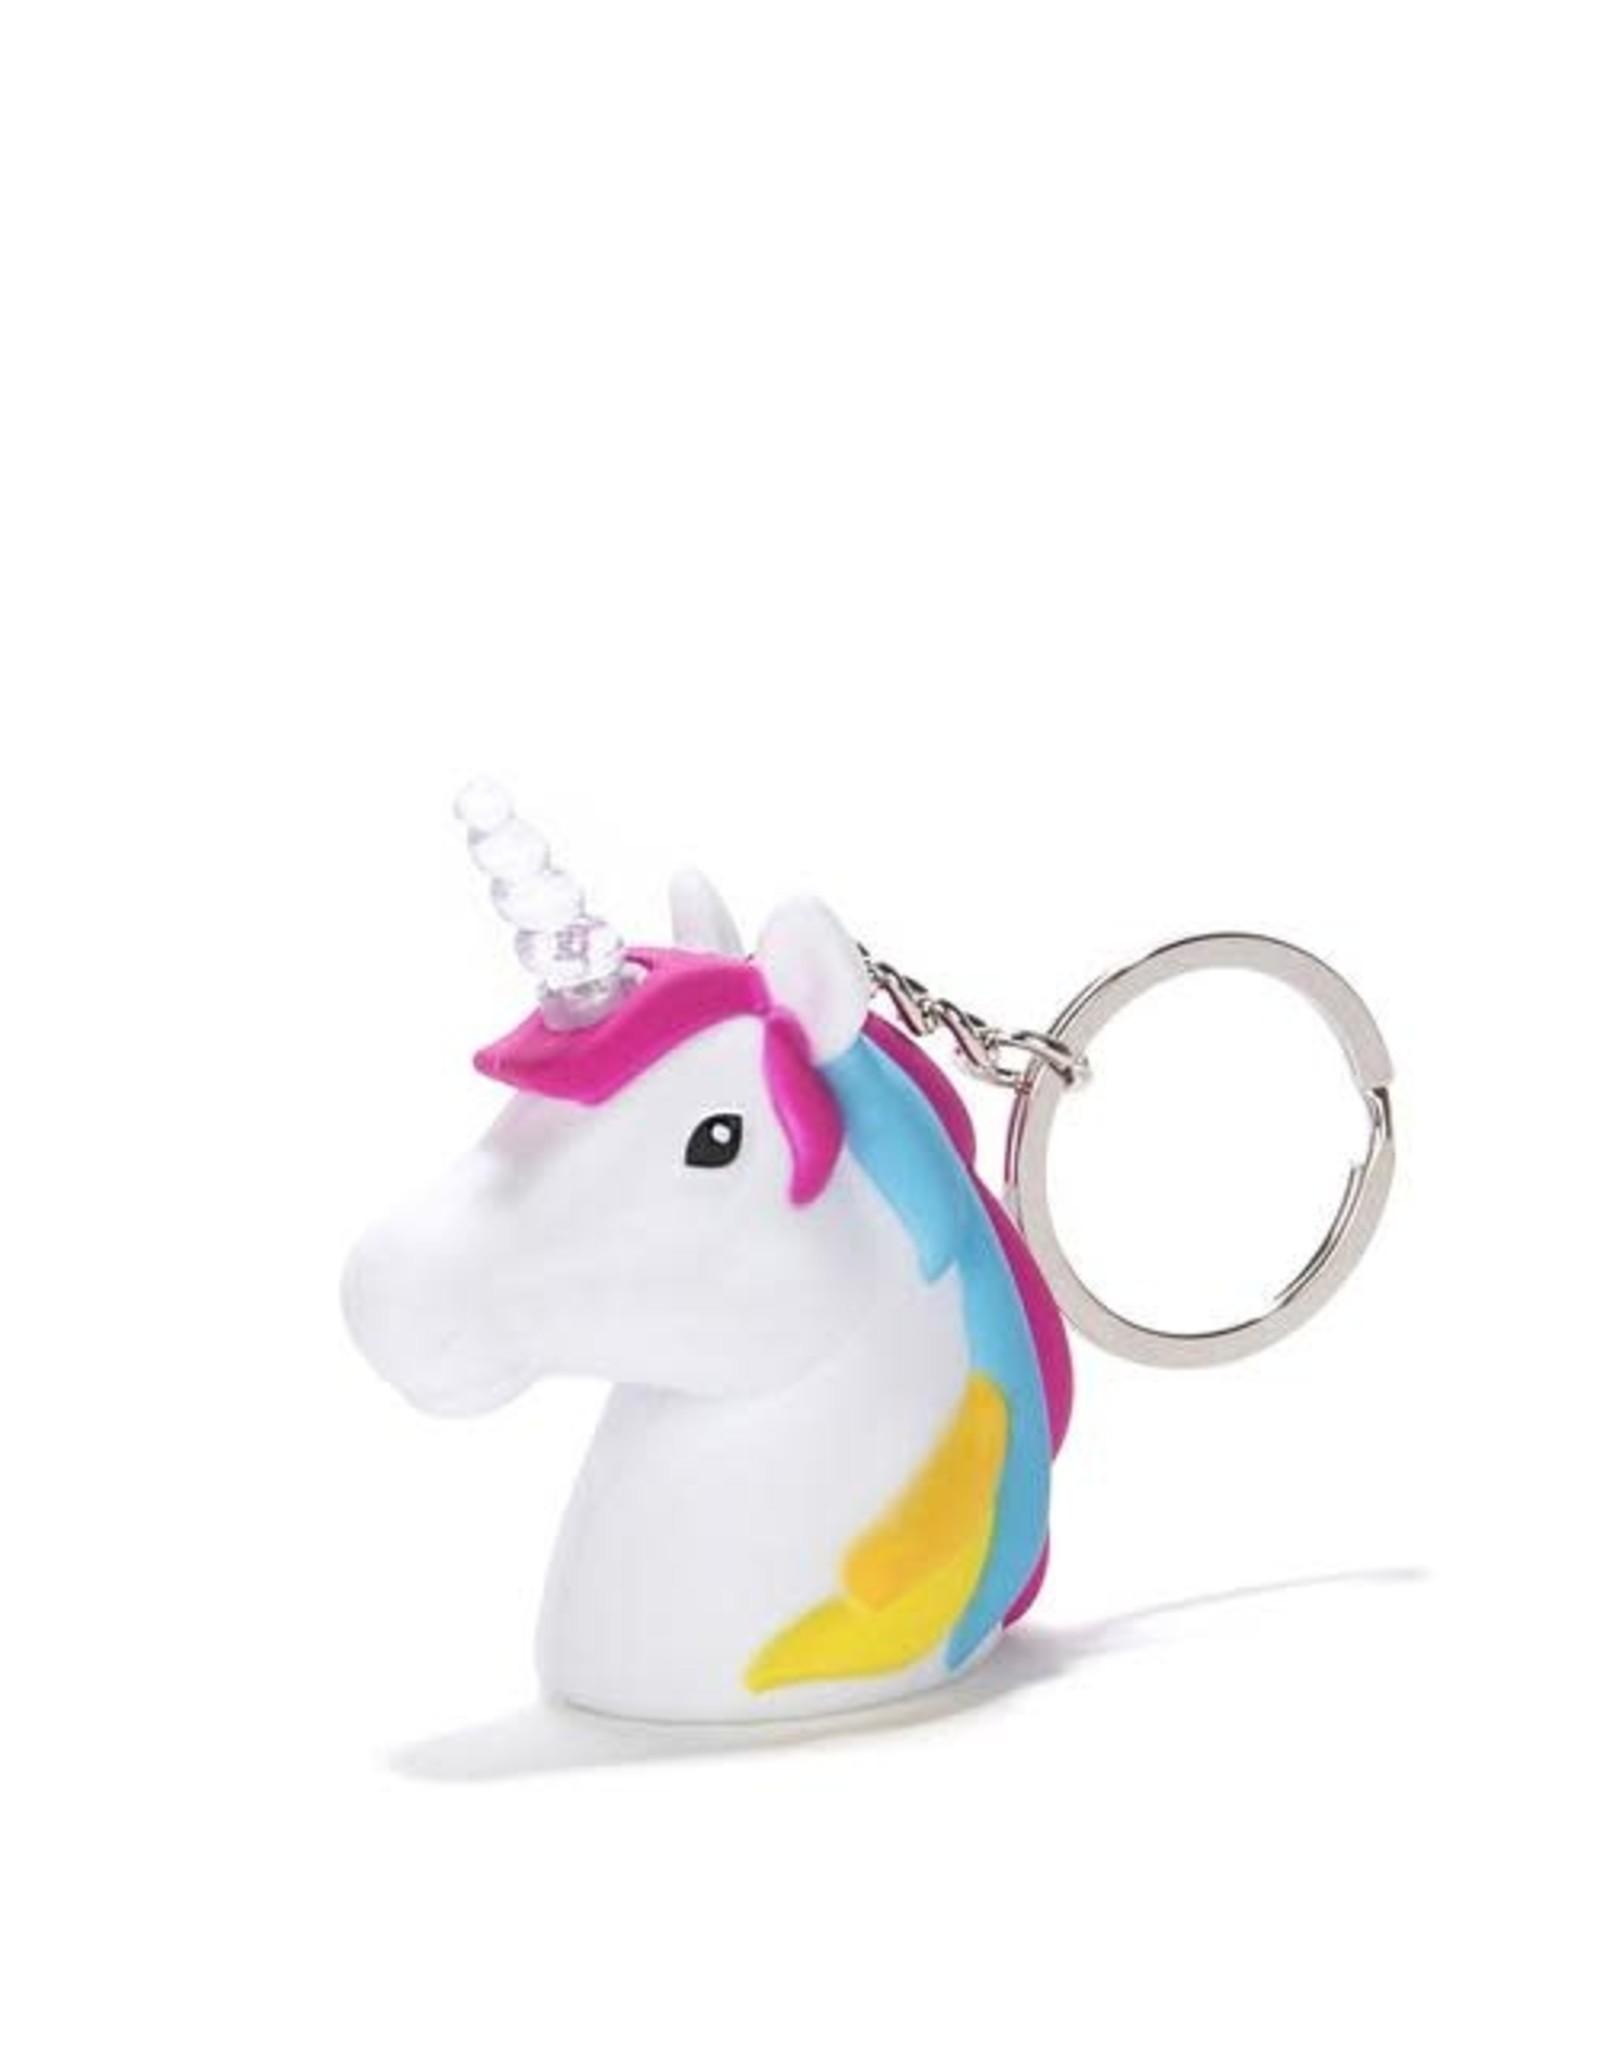 Kikkerland Unicorn Keychain with LED Light + Sounds - Kikkerland